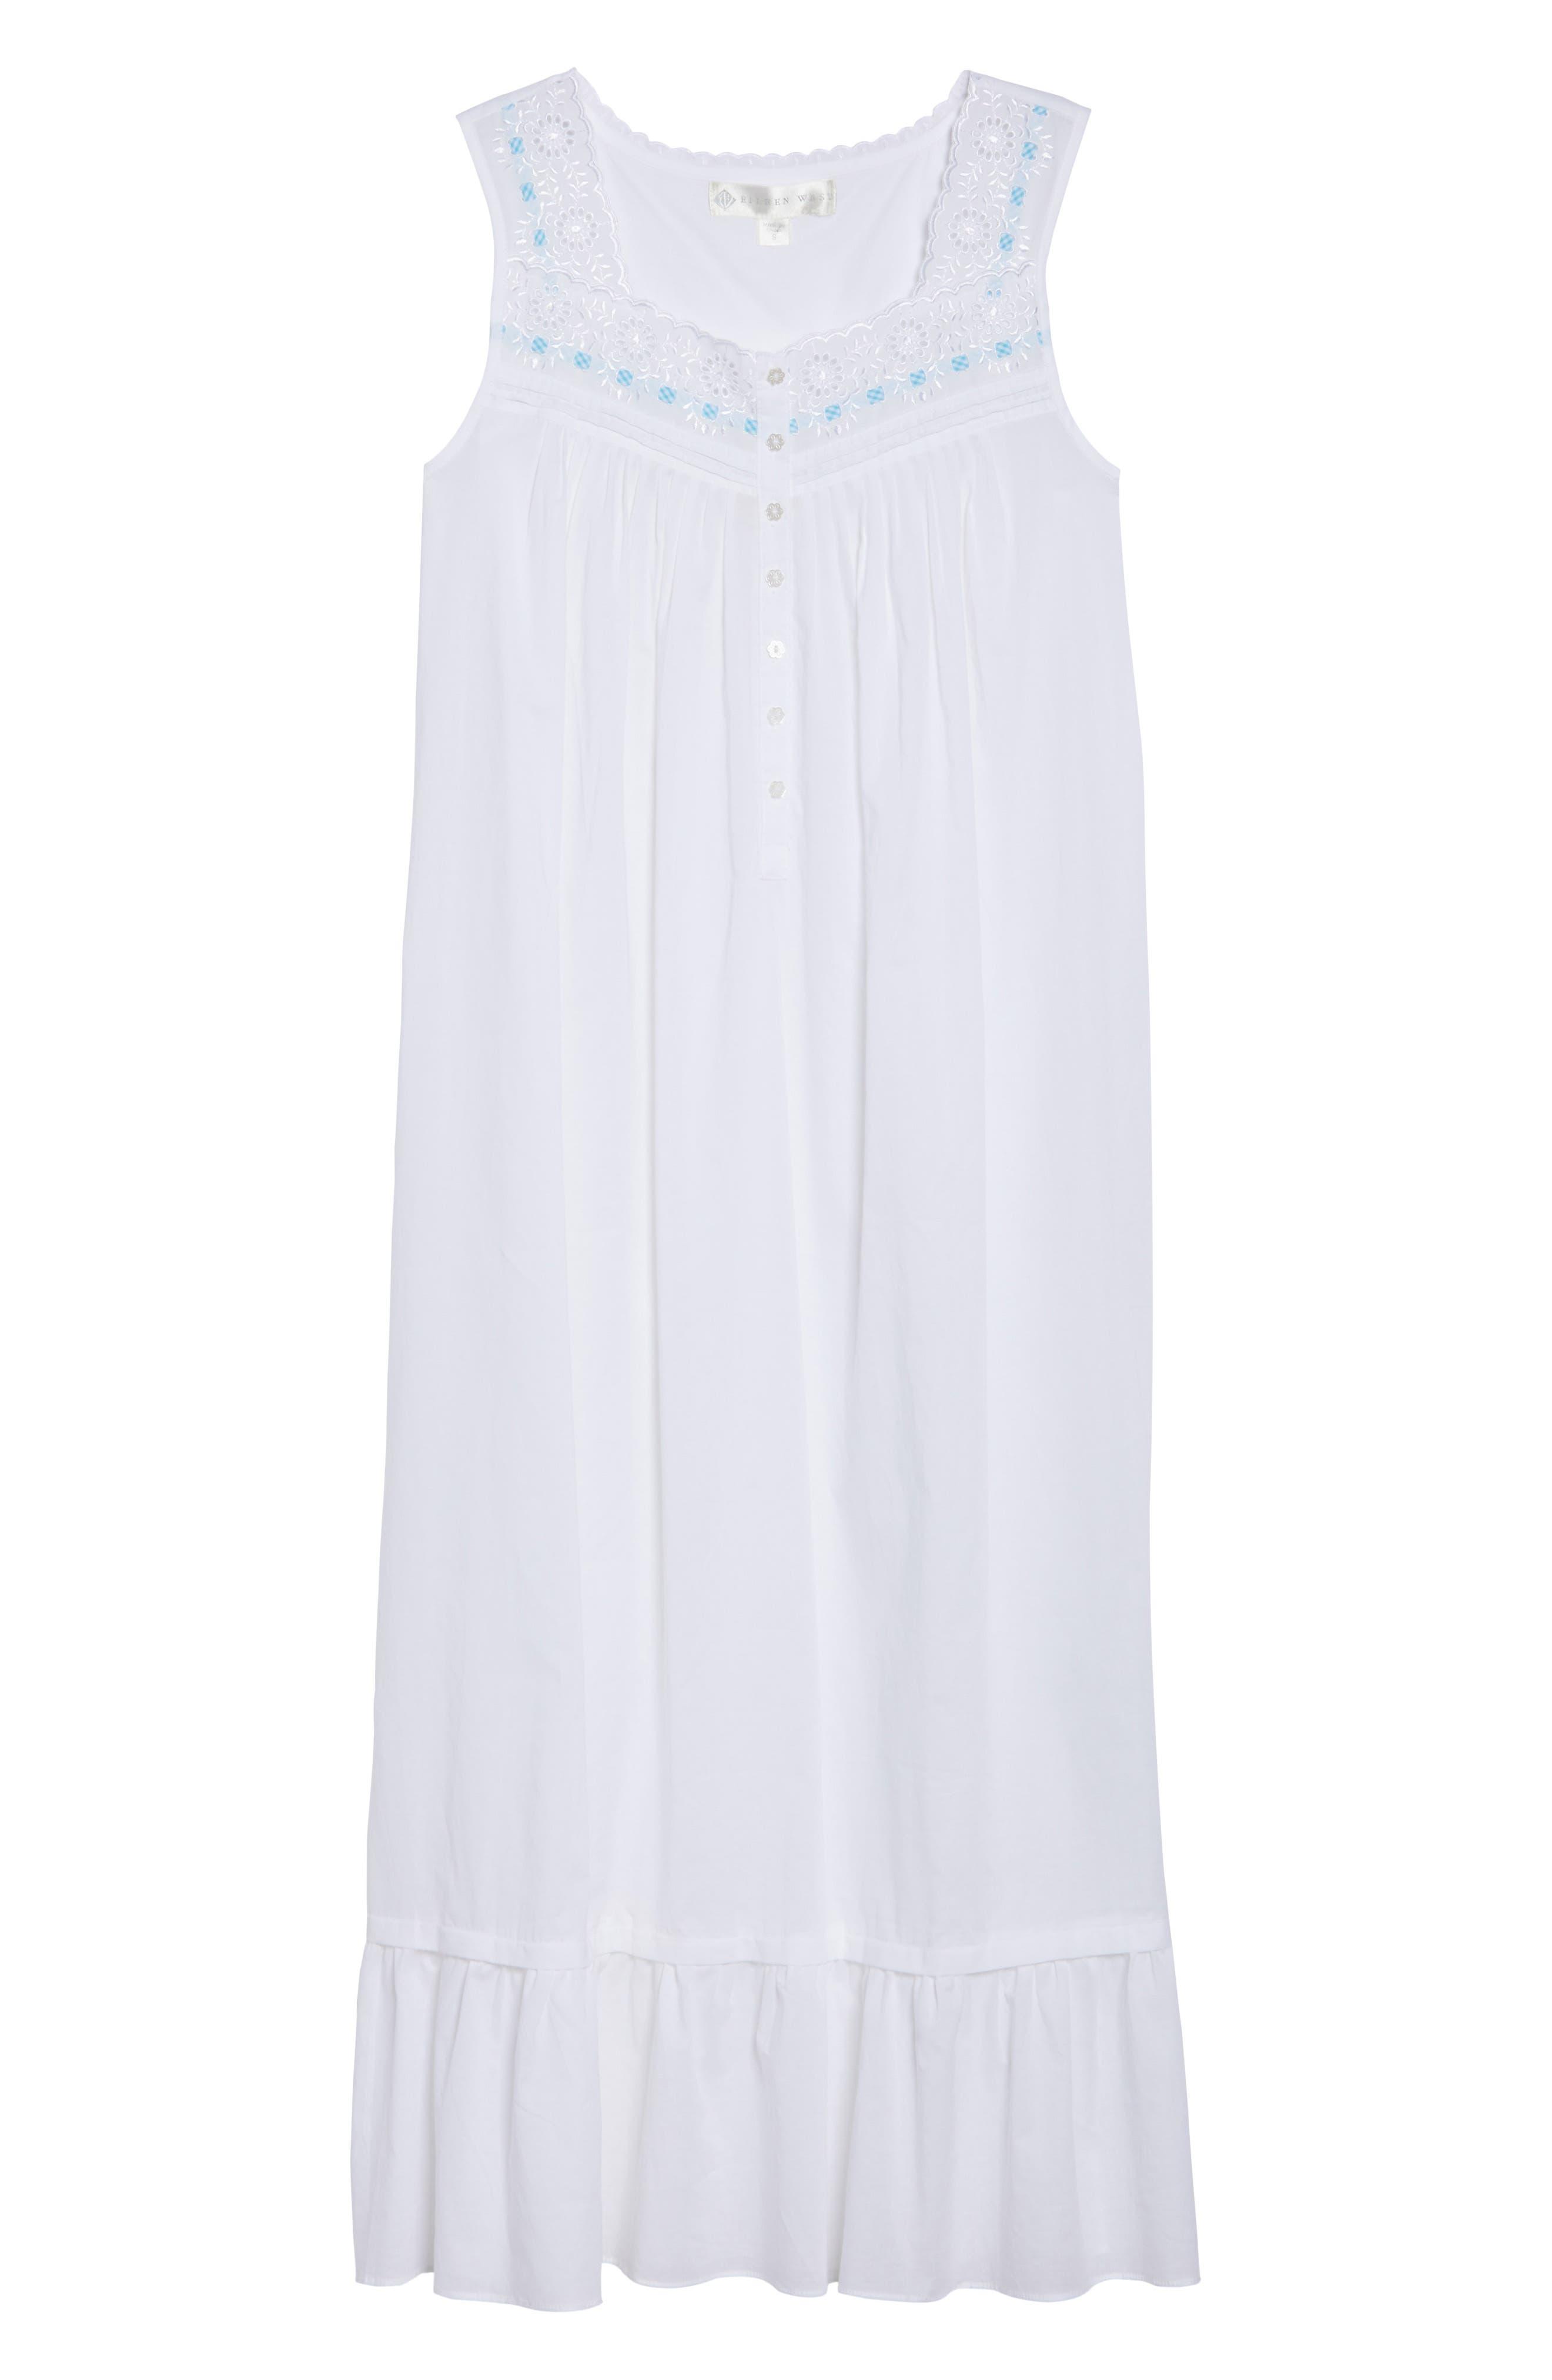 Ballet Nightgown,                             Alternate thumbnail 4, color,                             White